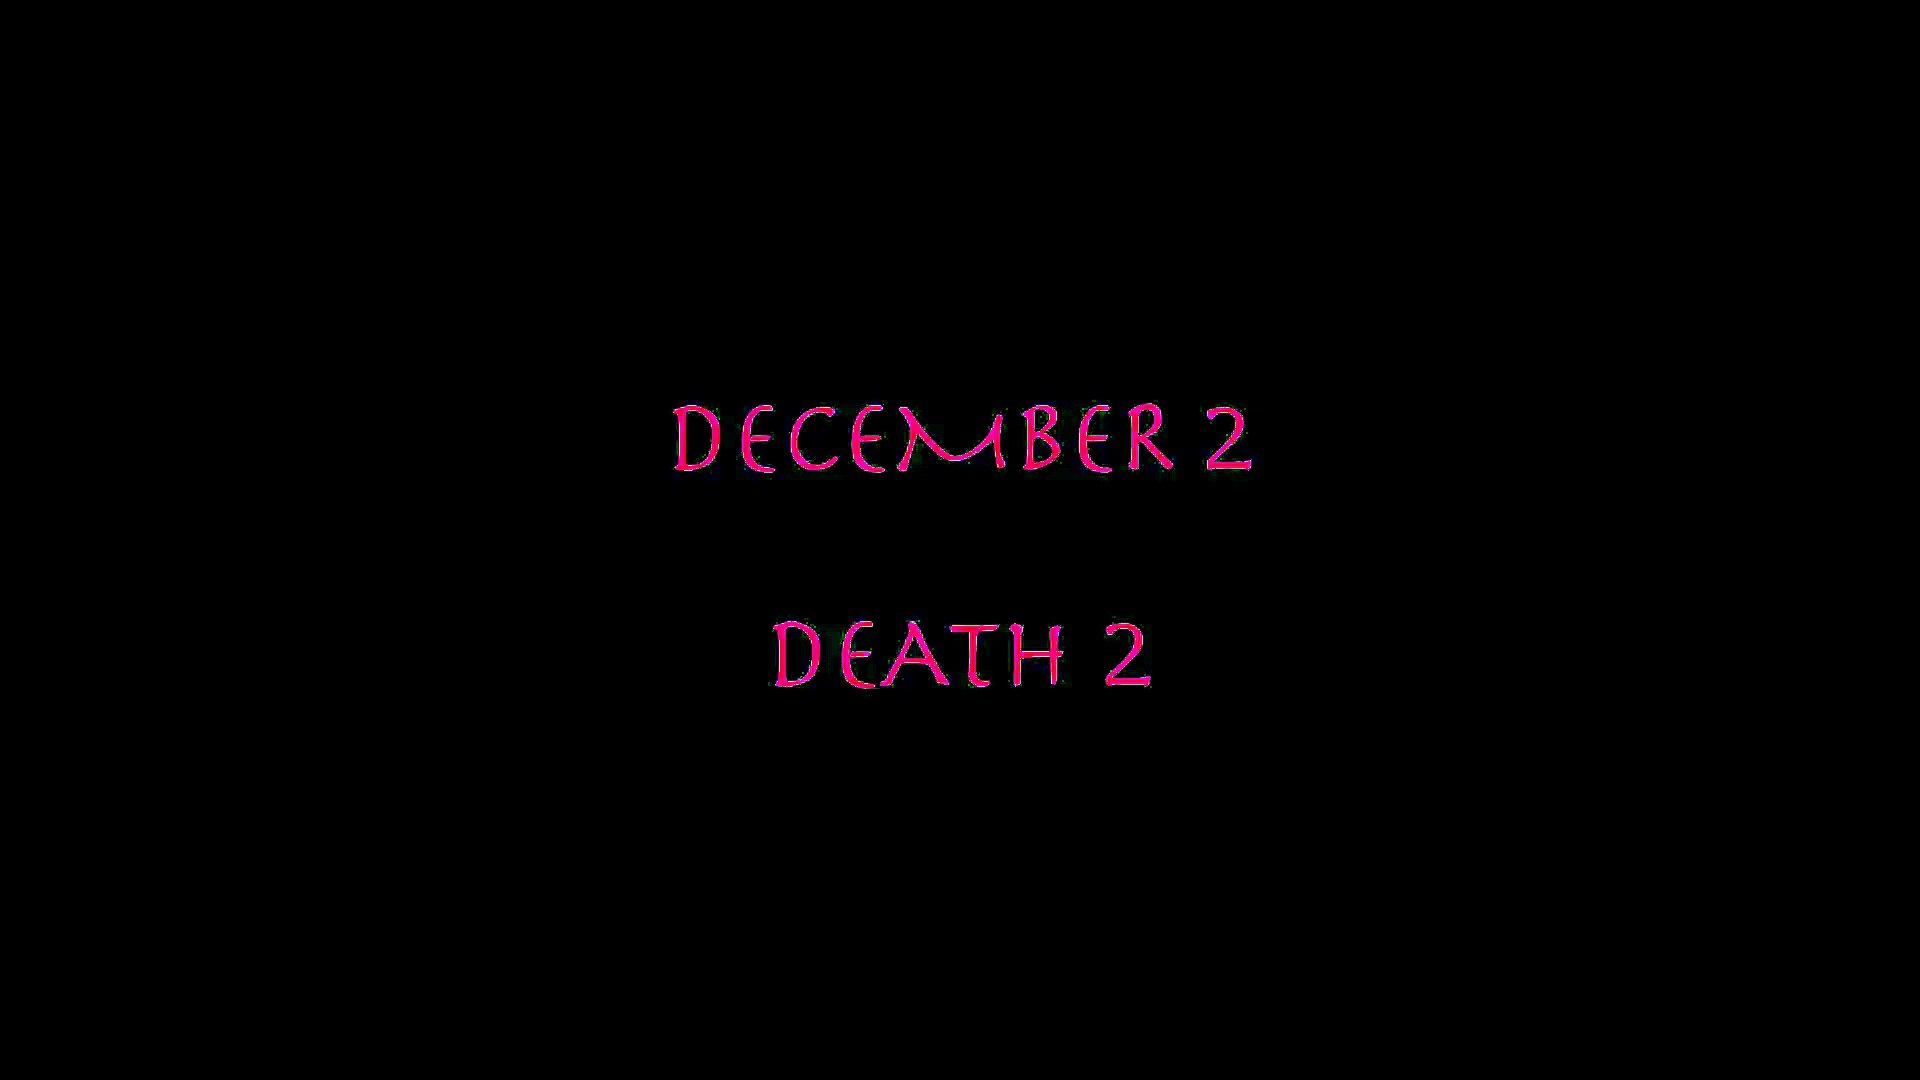 25 Deaths of the Elf on the Shelf Season 2: December 2 / Death 2